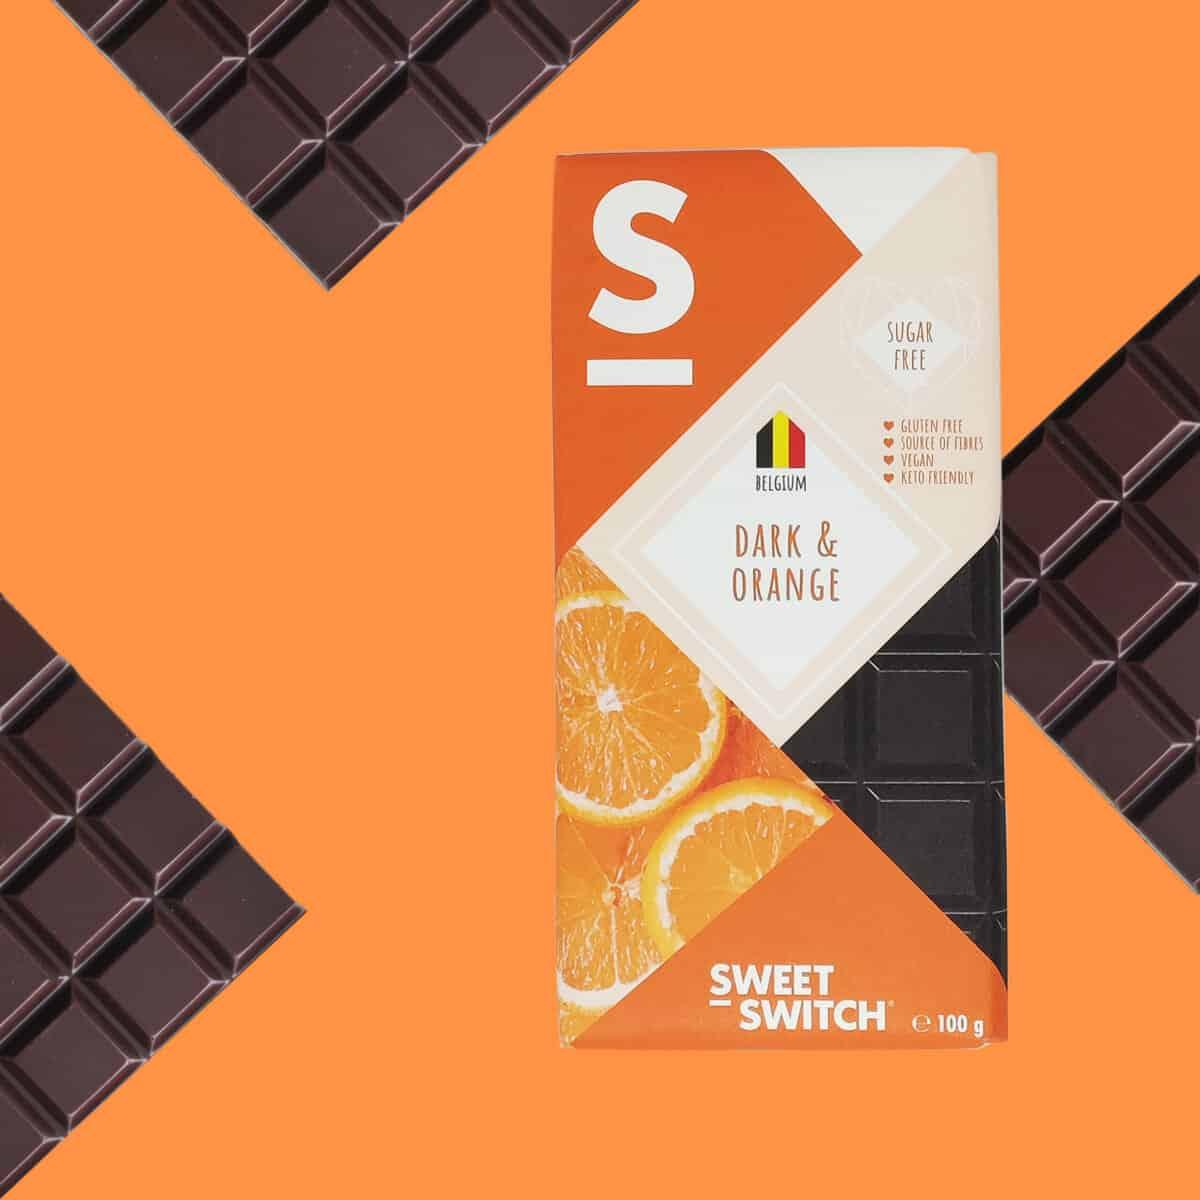 sugar free healthy confectionery SWEET-SWITCH dark chocolate + orange